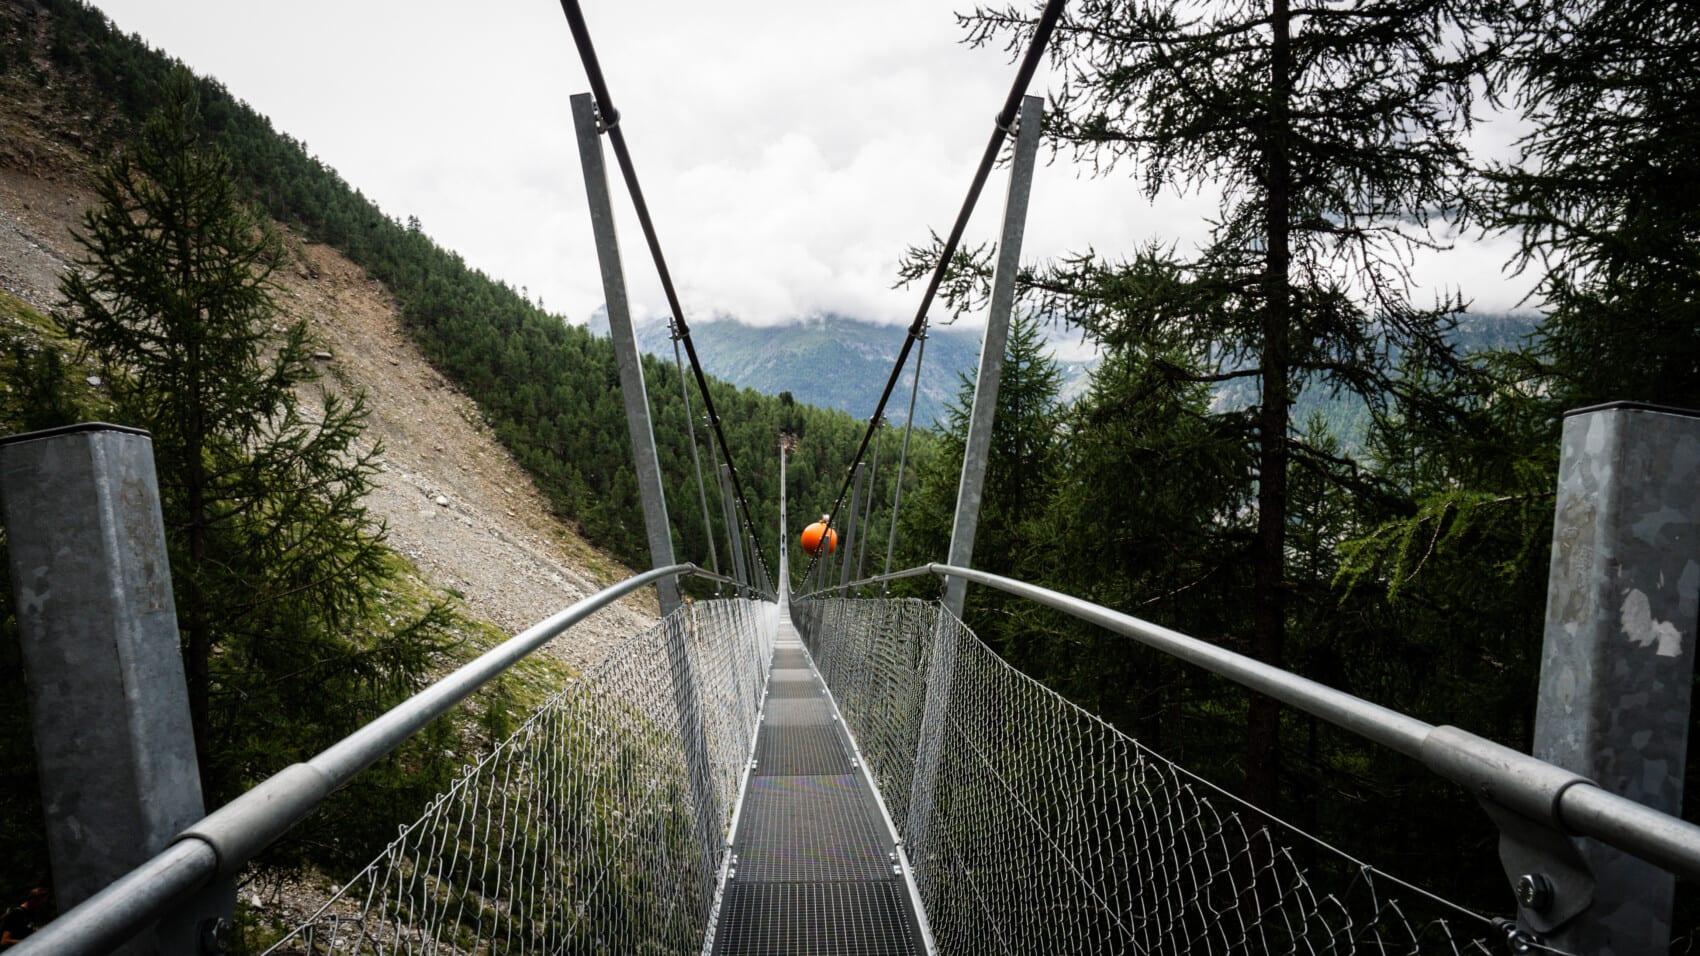 pont suspendu piéton europaweg